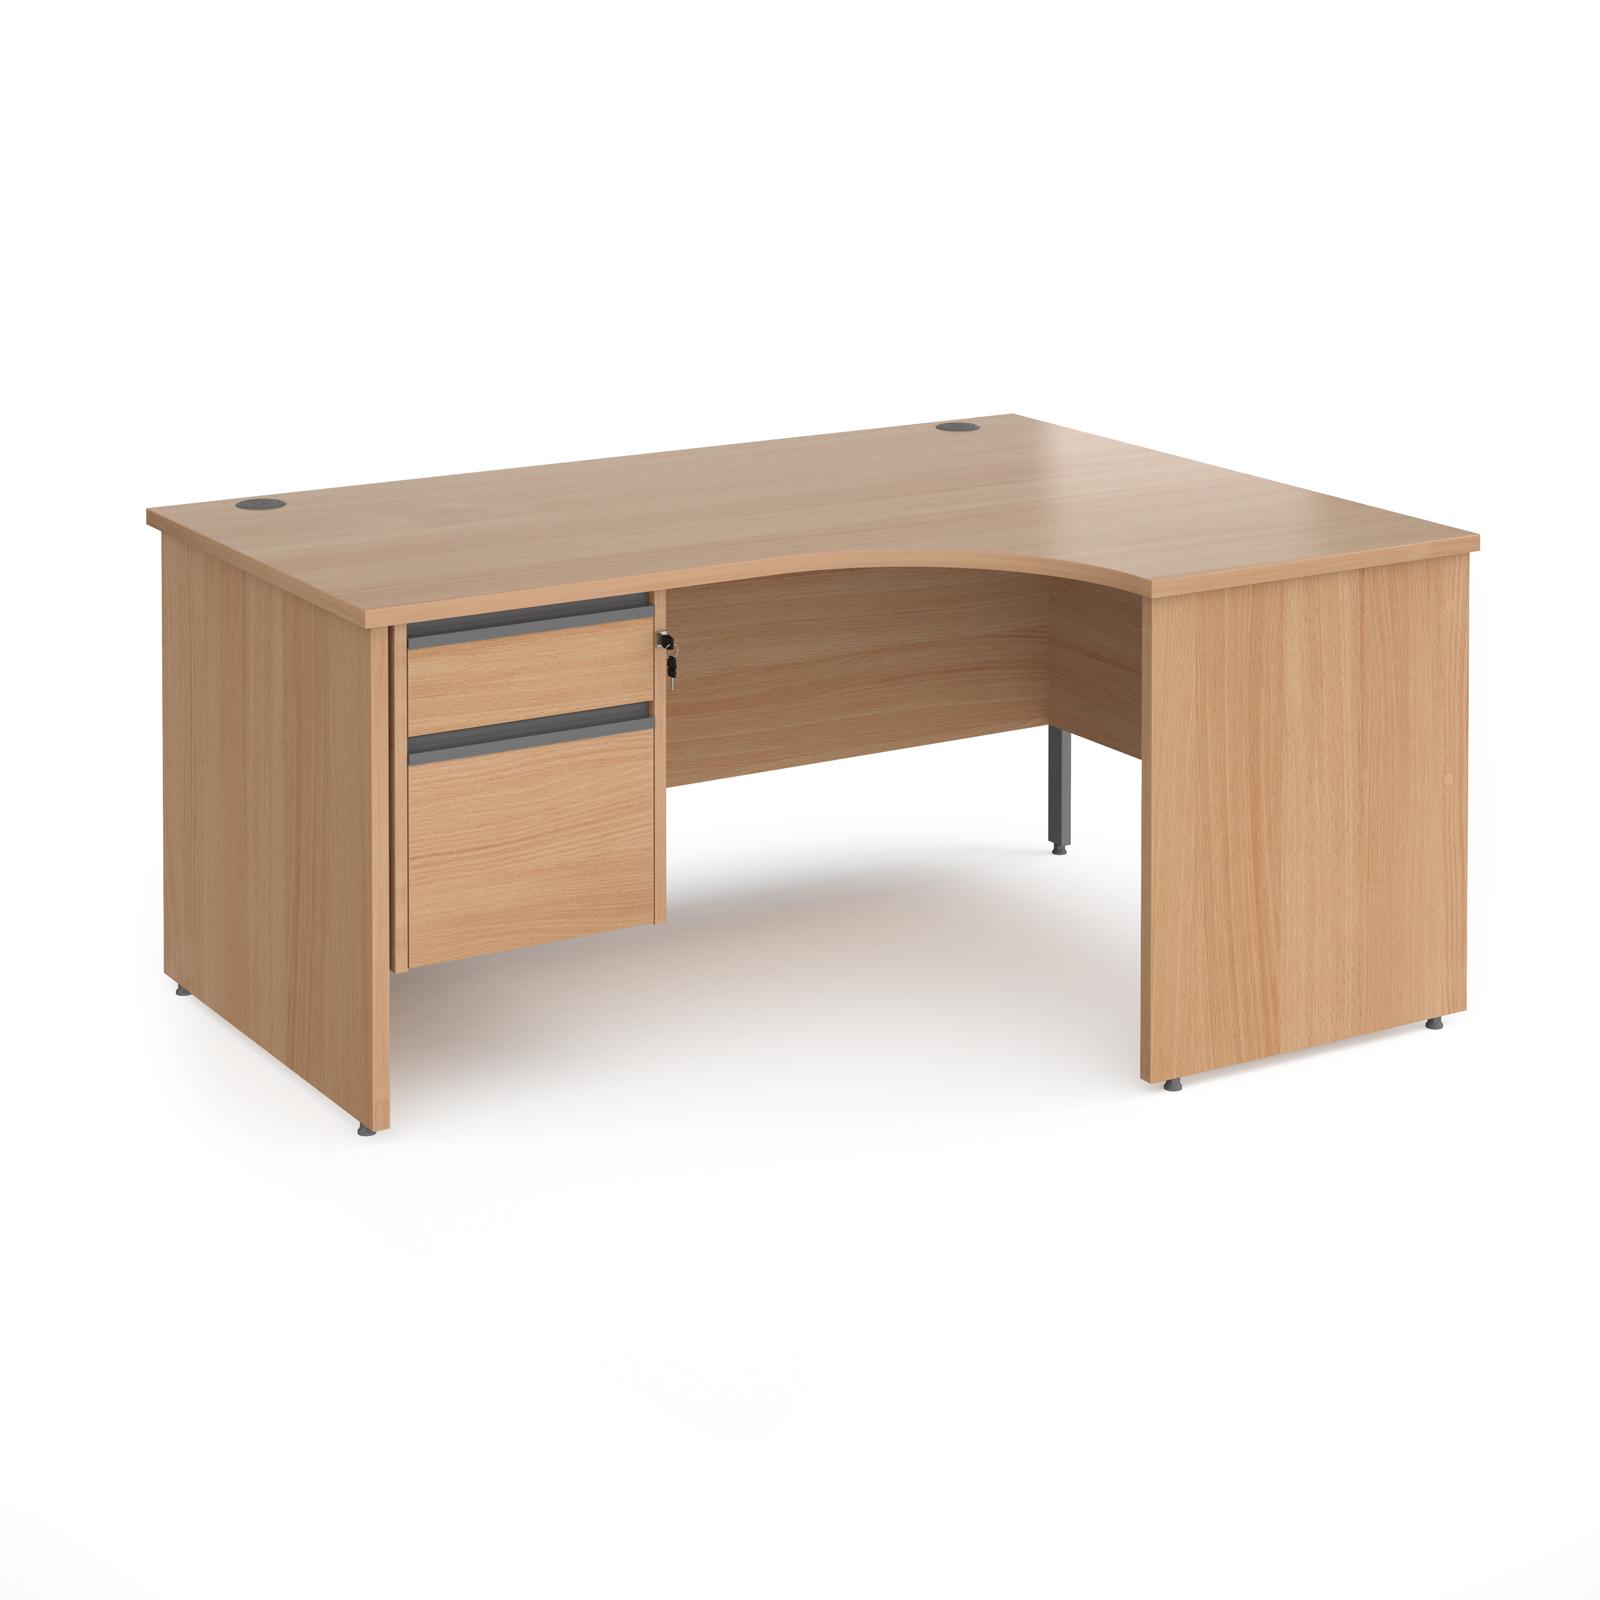 Contract 25 panel leg RH ergonomic desk with 2 drawer ped